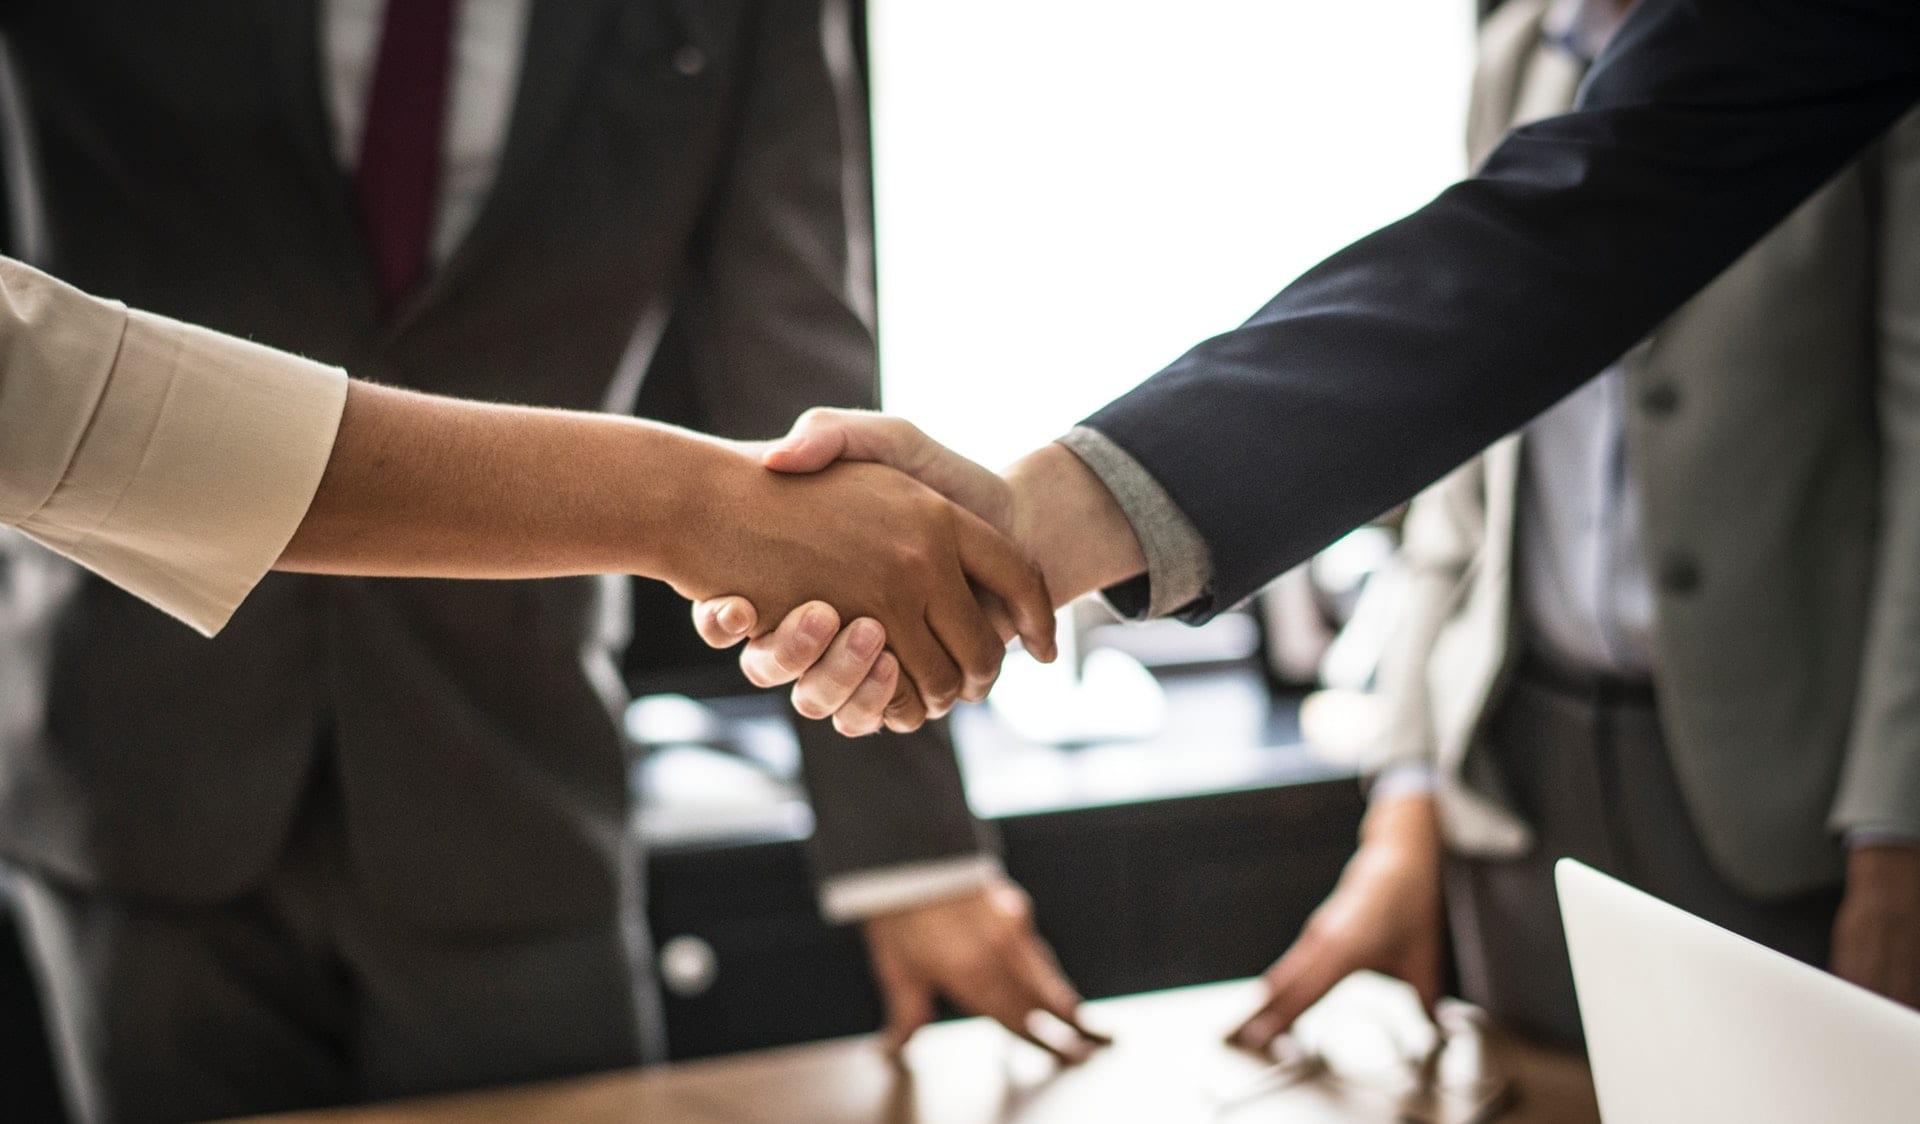 Premsafe & Kingspan Partnership